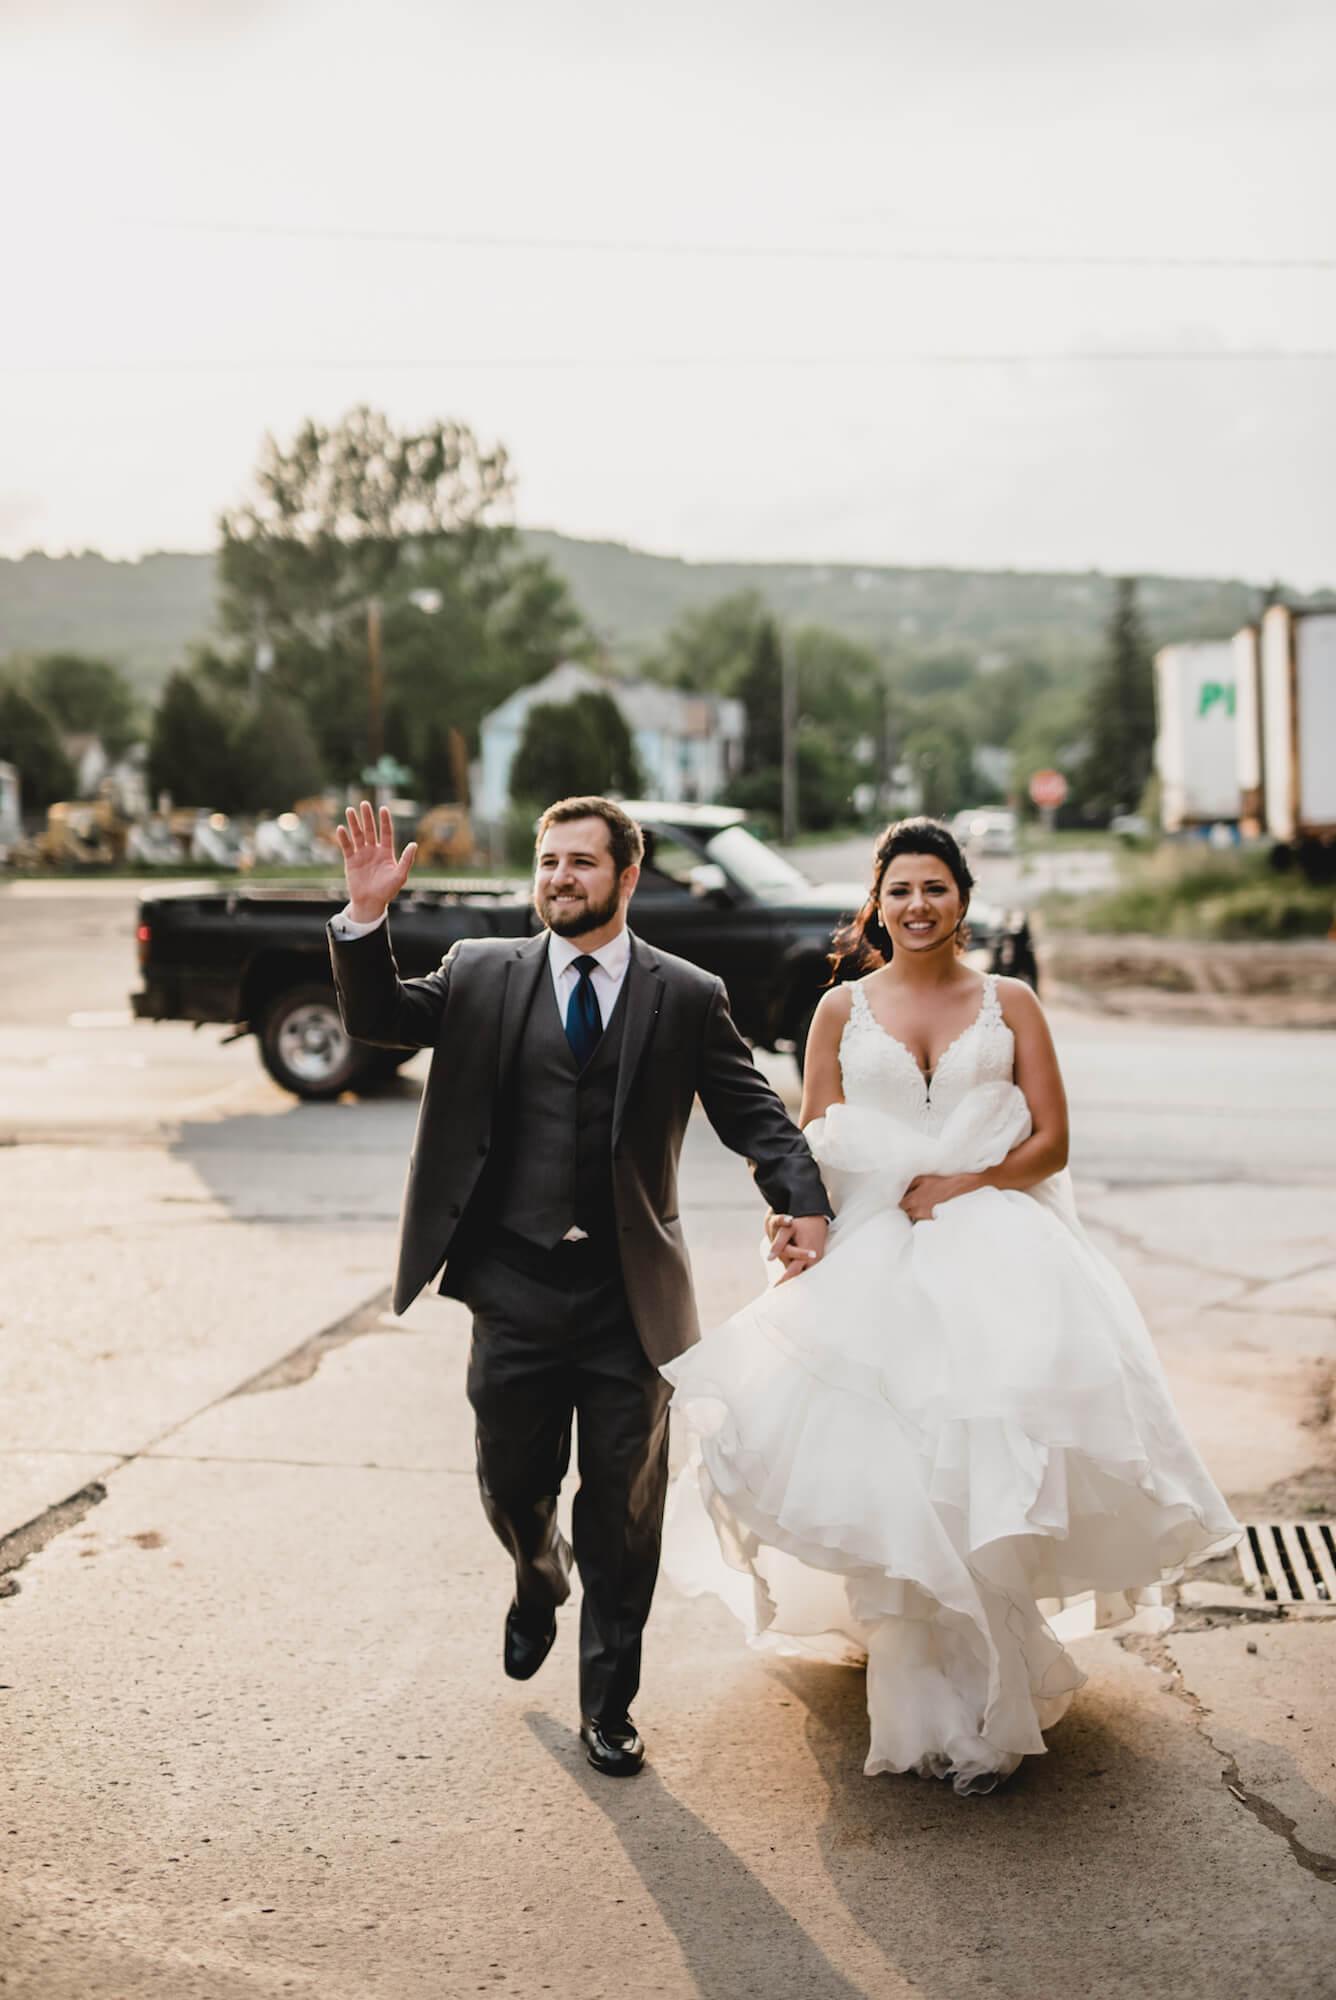 engle-olson-jen-chad-minnesota-wedding- (827 of 1332).jpg